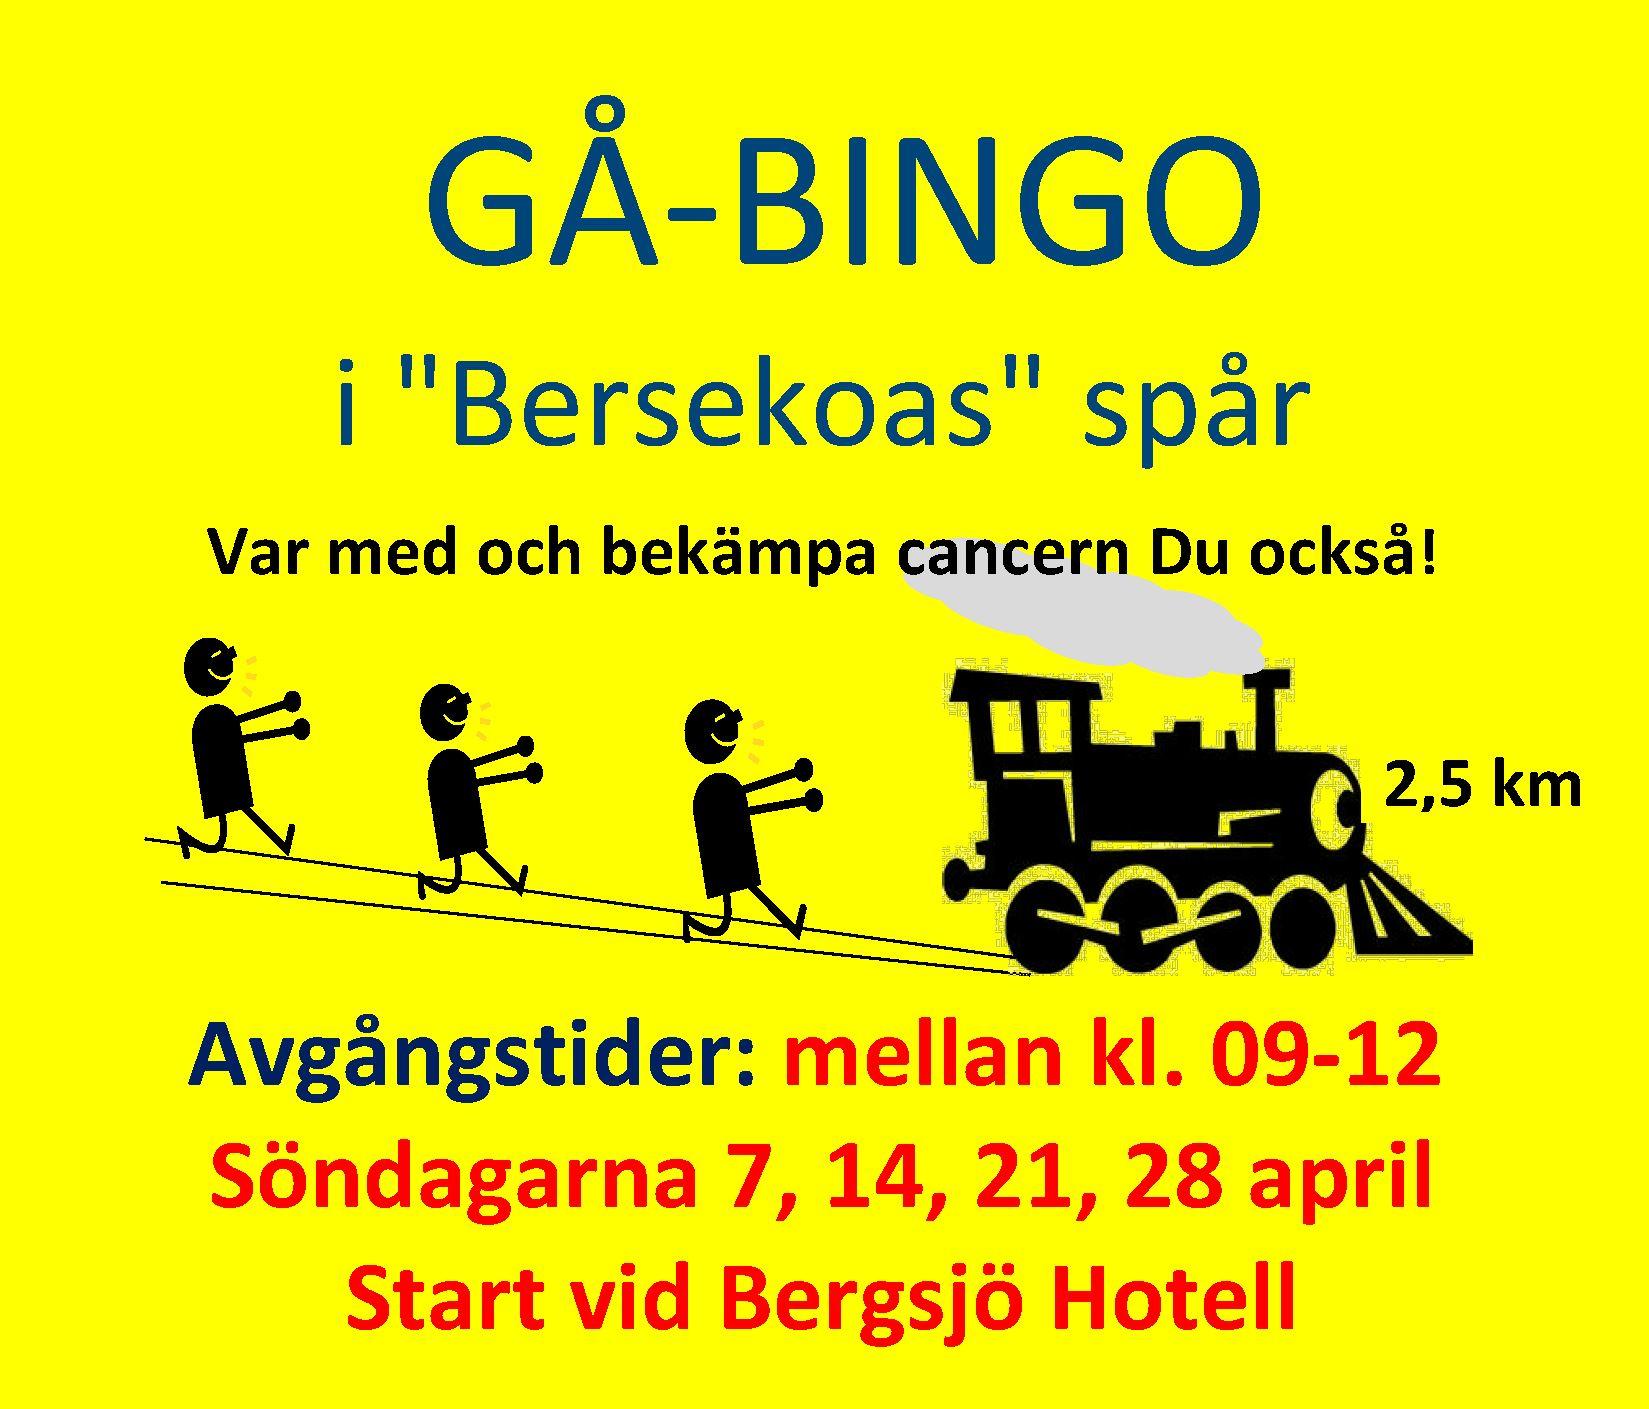 Gå-bingo - i